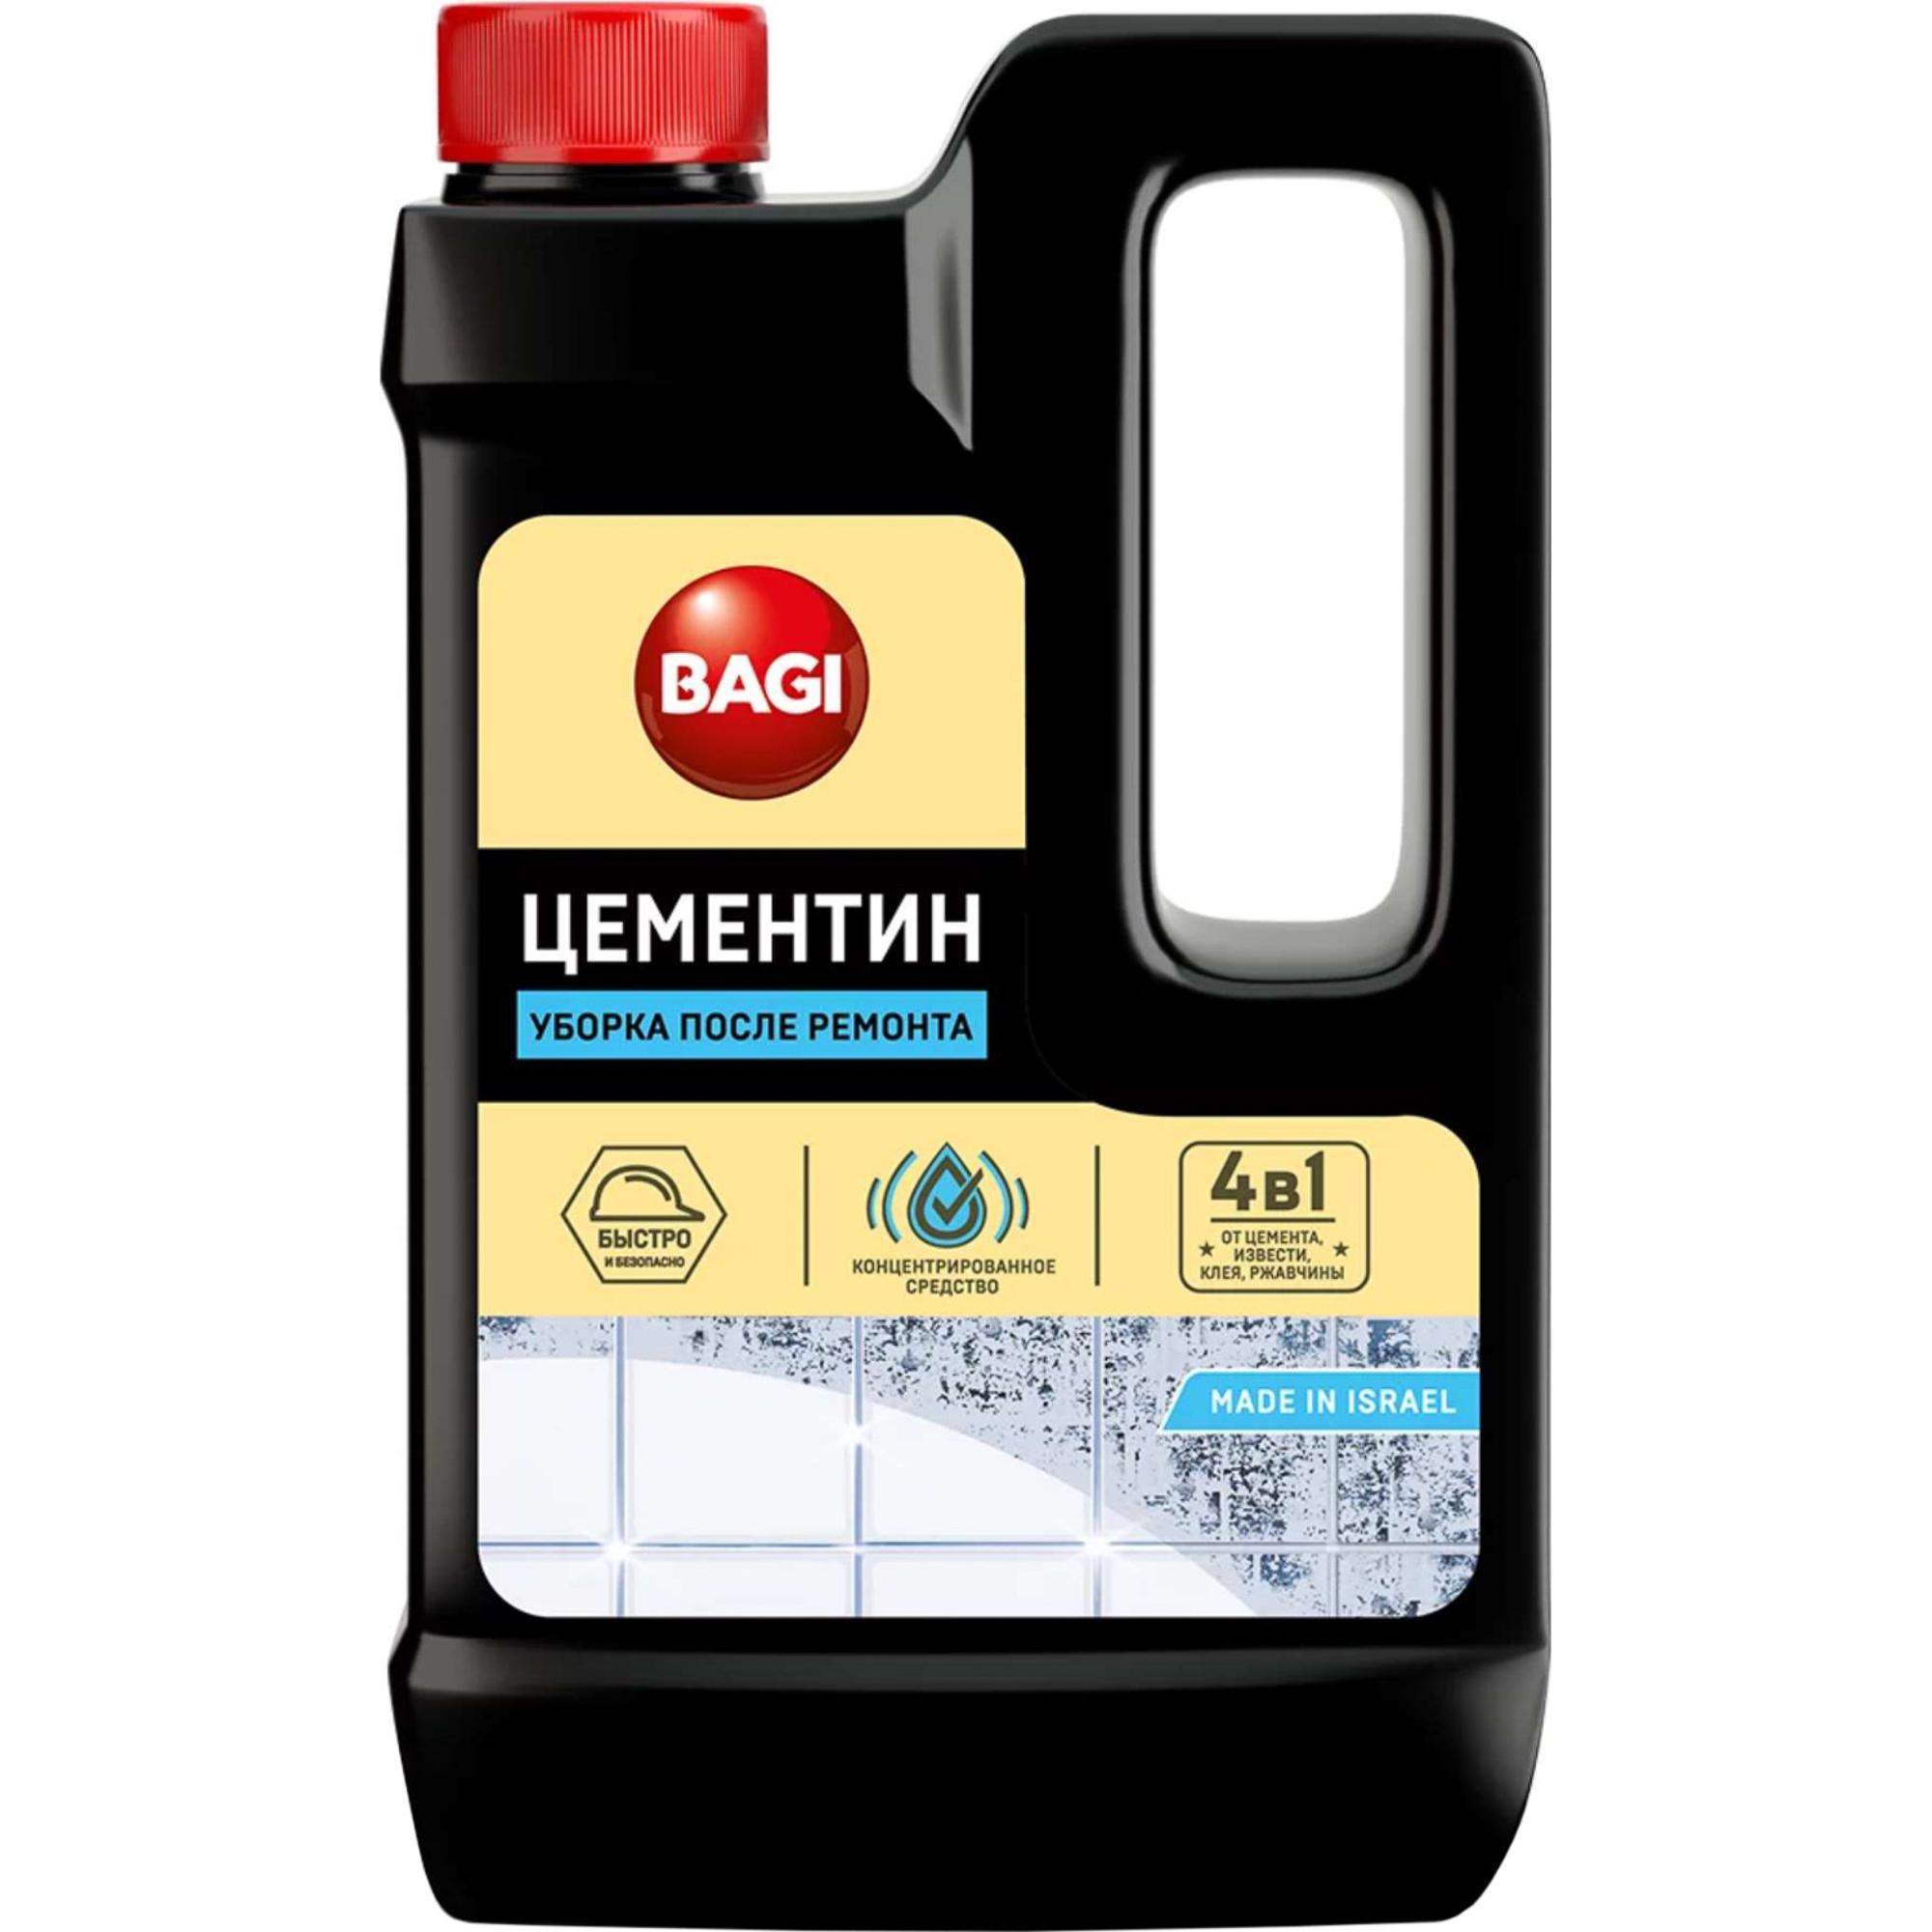 Чистящее средство Bagi Цементин 0,5 л